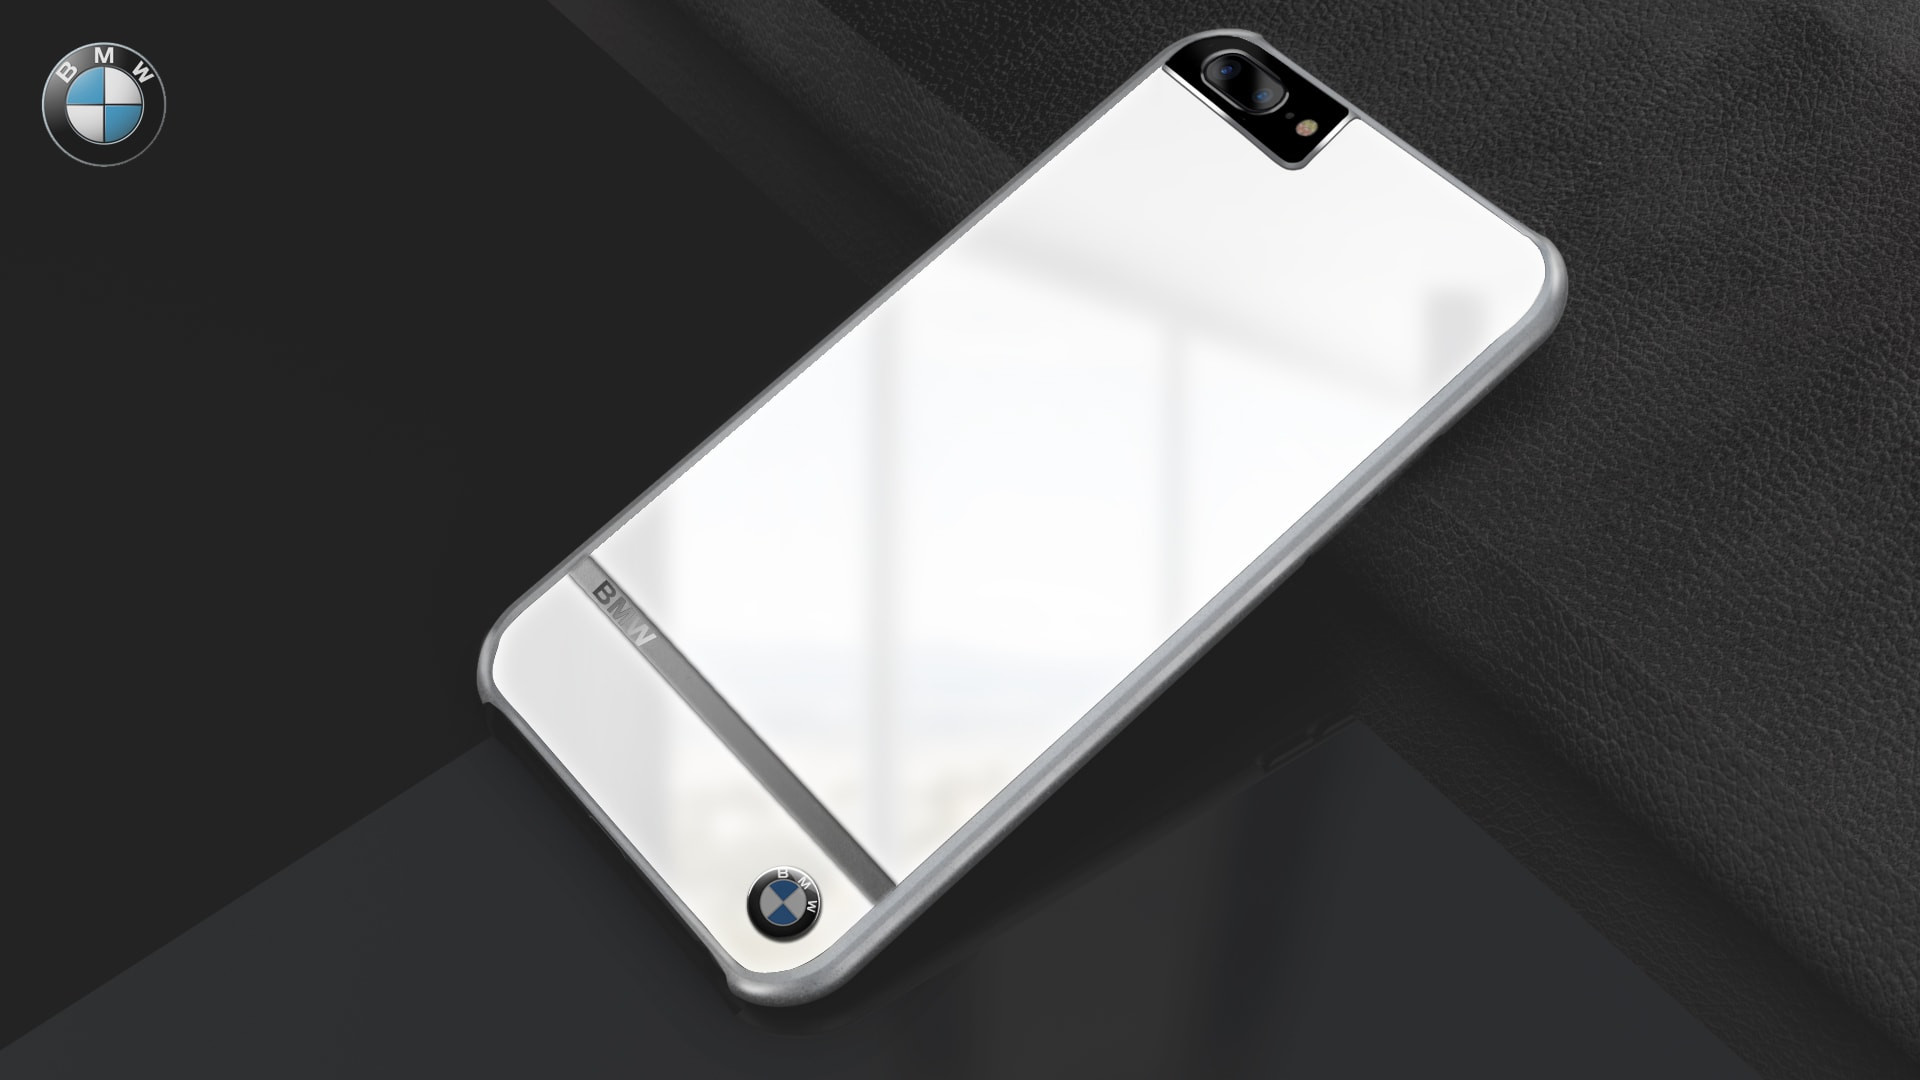 bmw apple iphone 7 plus mirror signature shine. Black Bedroom Furniture Sets. Home Design Ideas